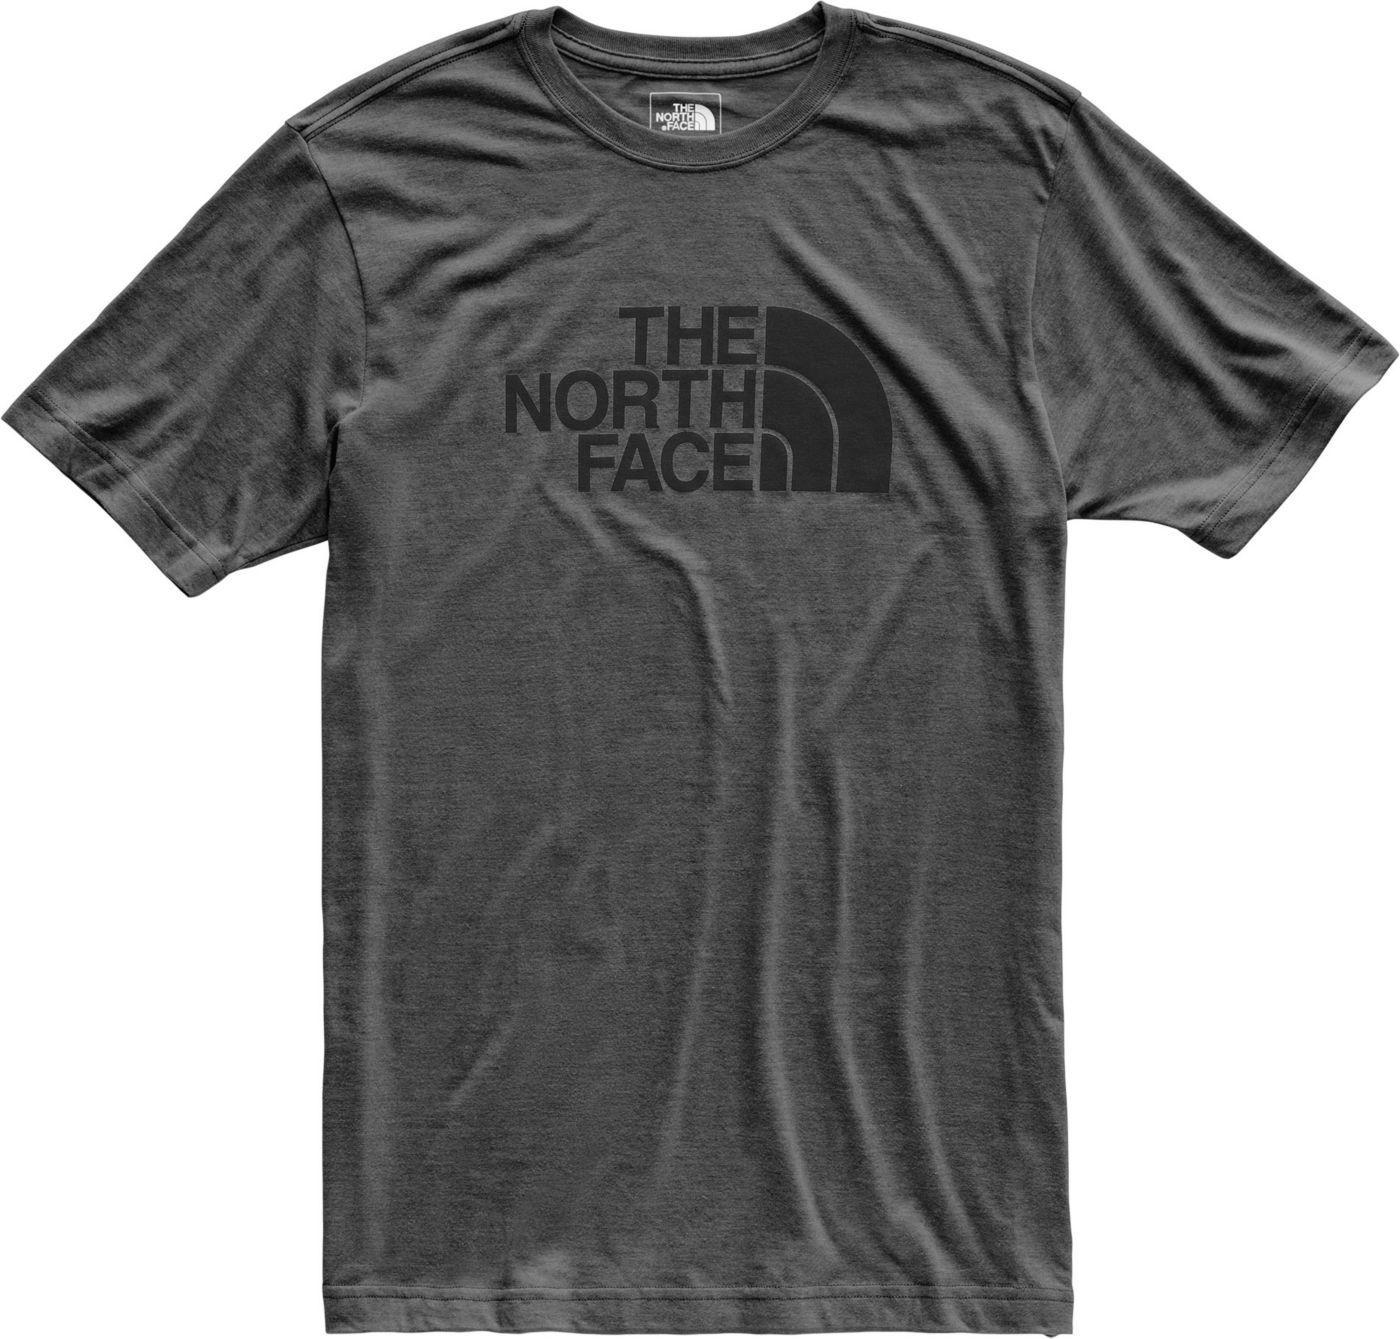 The North Face Men's Half Dome Tri-Blend T-Shirt